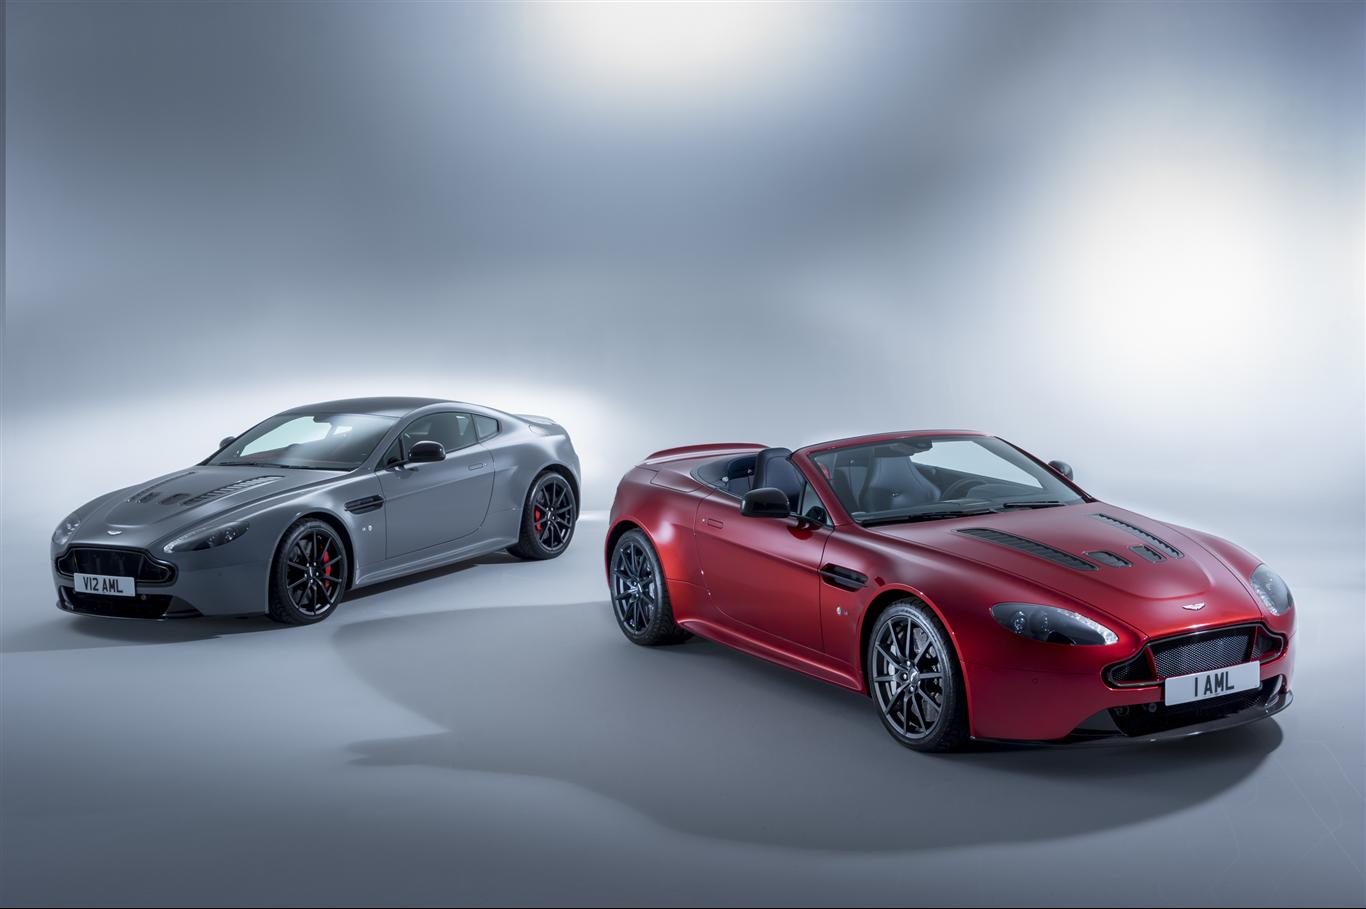 Aston Martin V12 Vantage S Roadster 2015 - 3